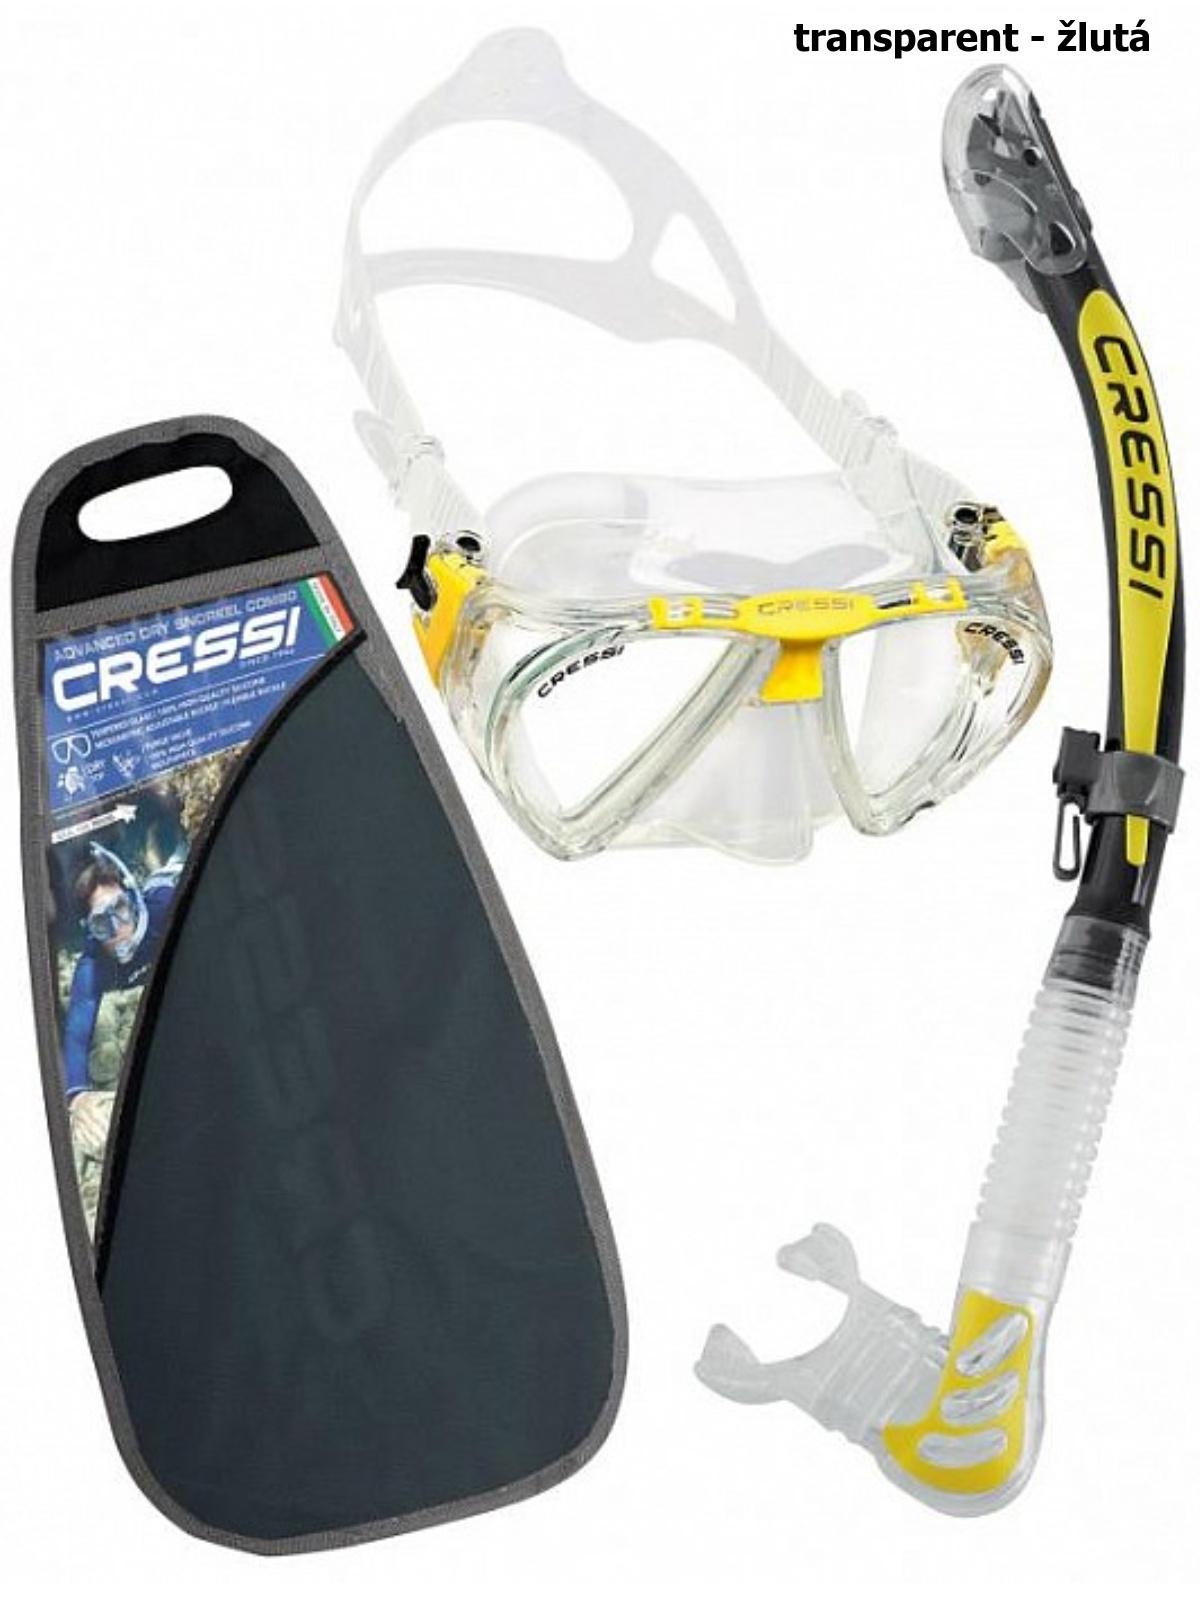 Potápačský set CRESSI Penta+Alpha Ultra Dry - transparent žltý